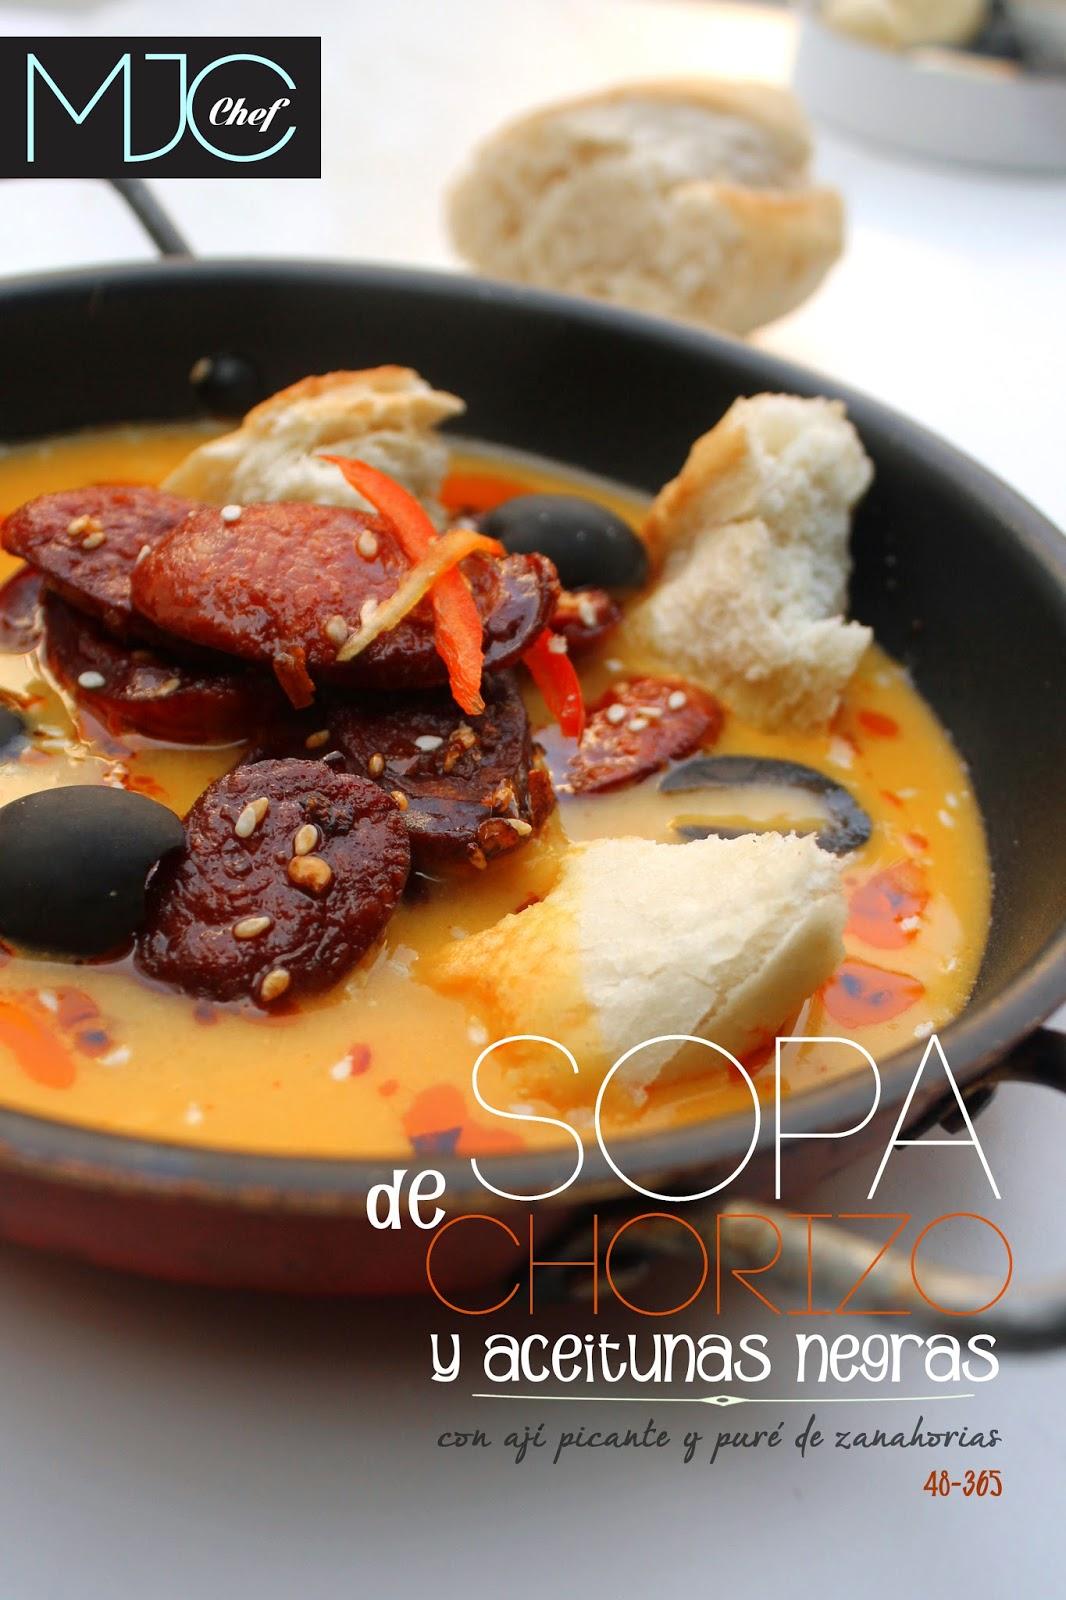 Sopa de chorizo